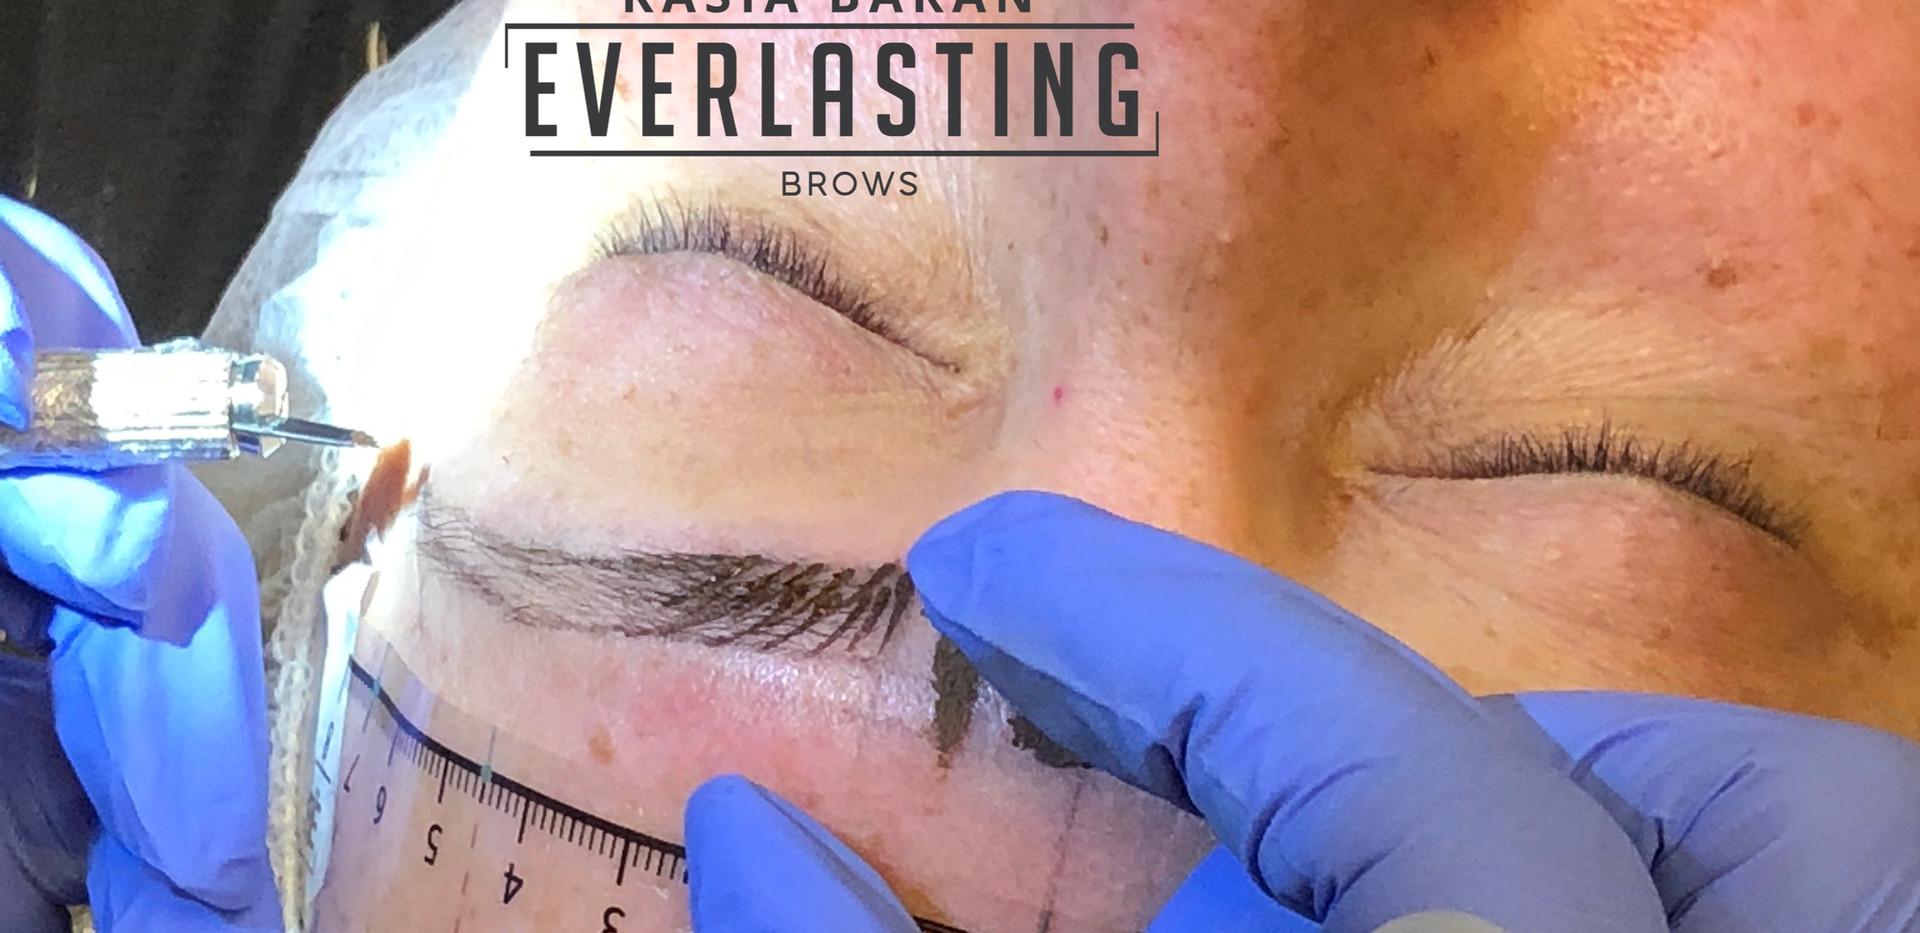 microbladingbrows